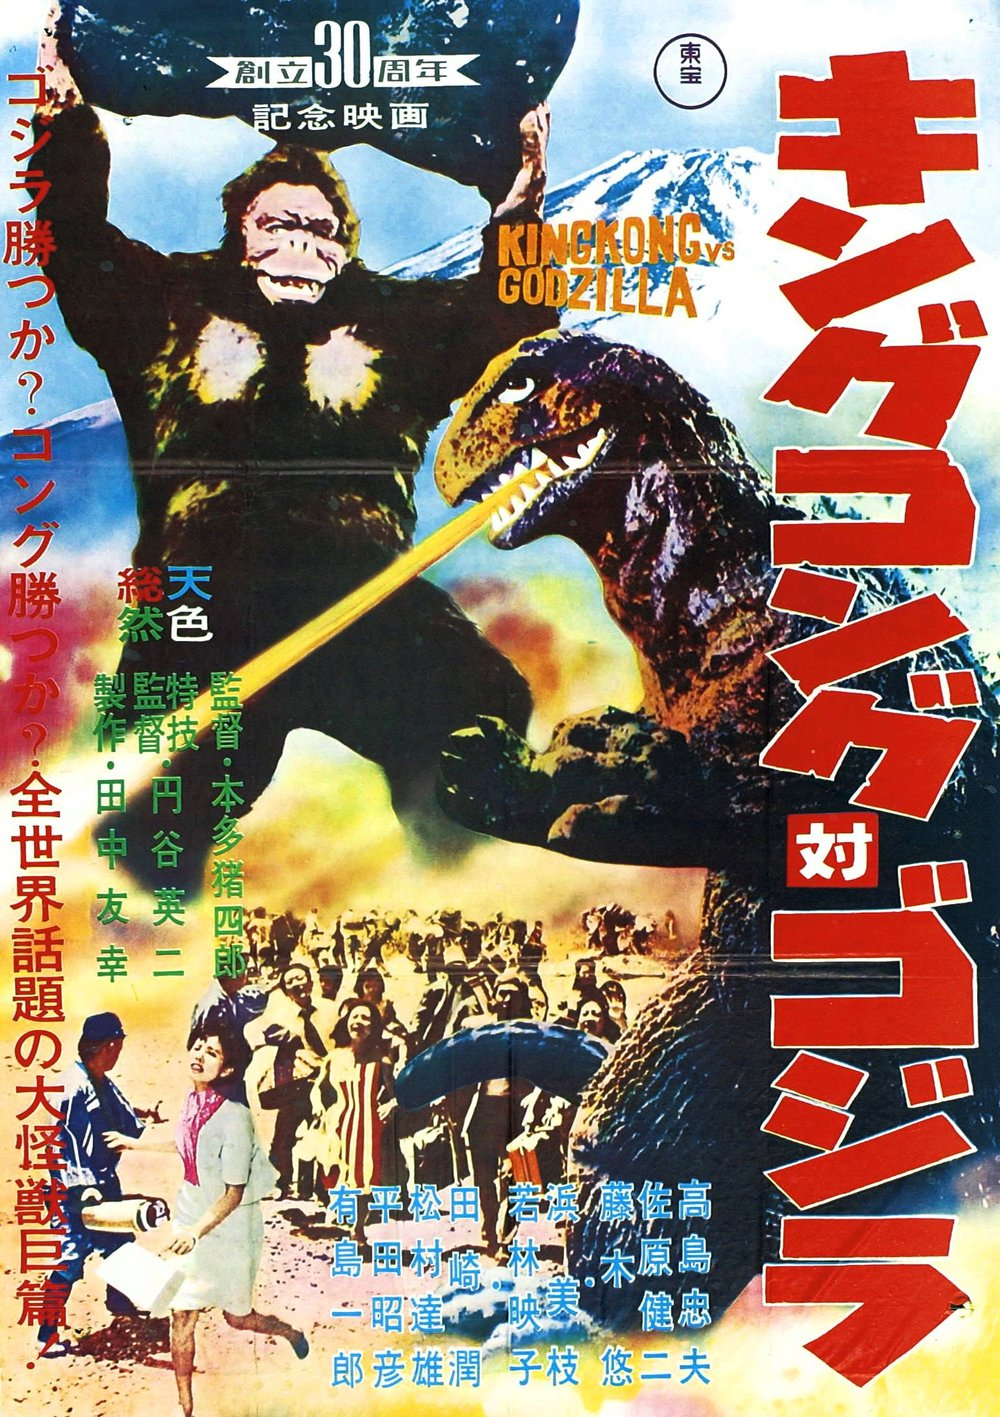 king_kong_vs_godzilla_poster_01.jpg